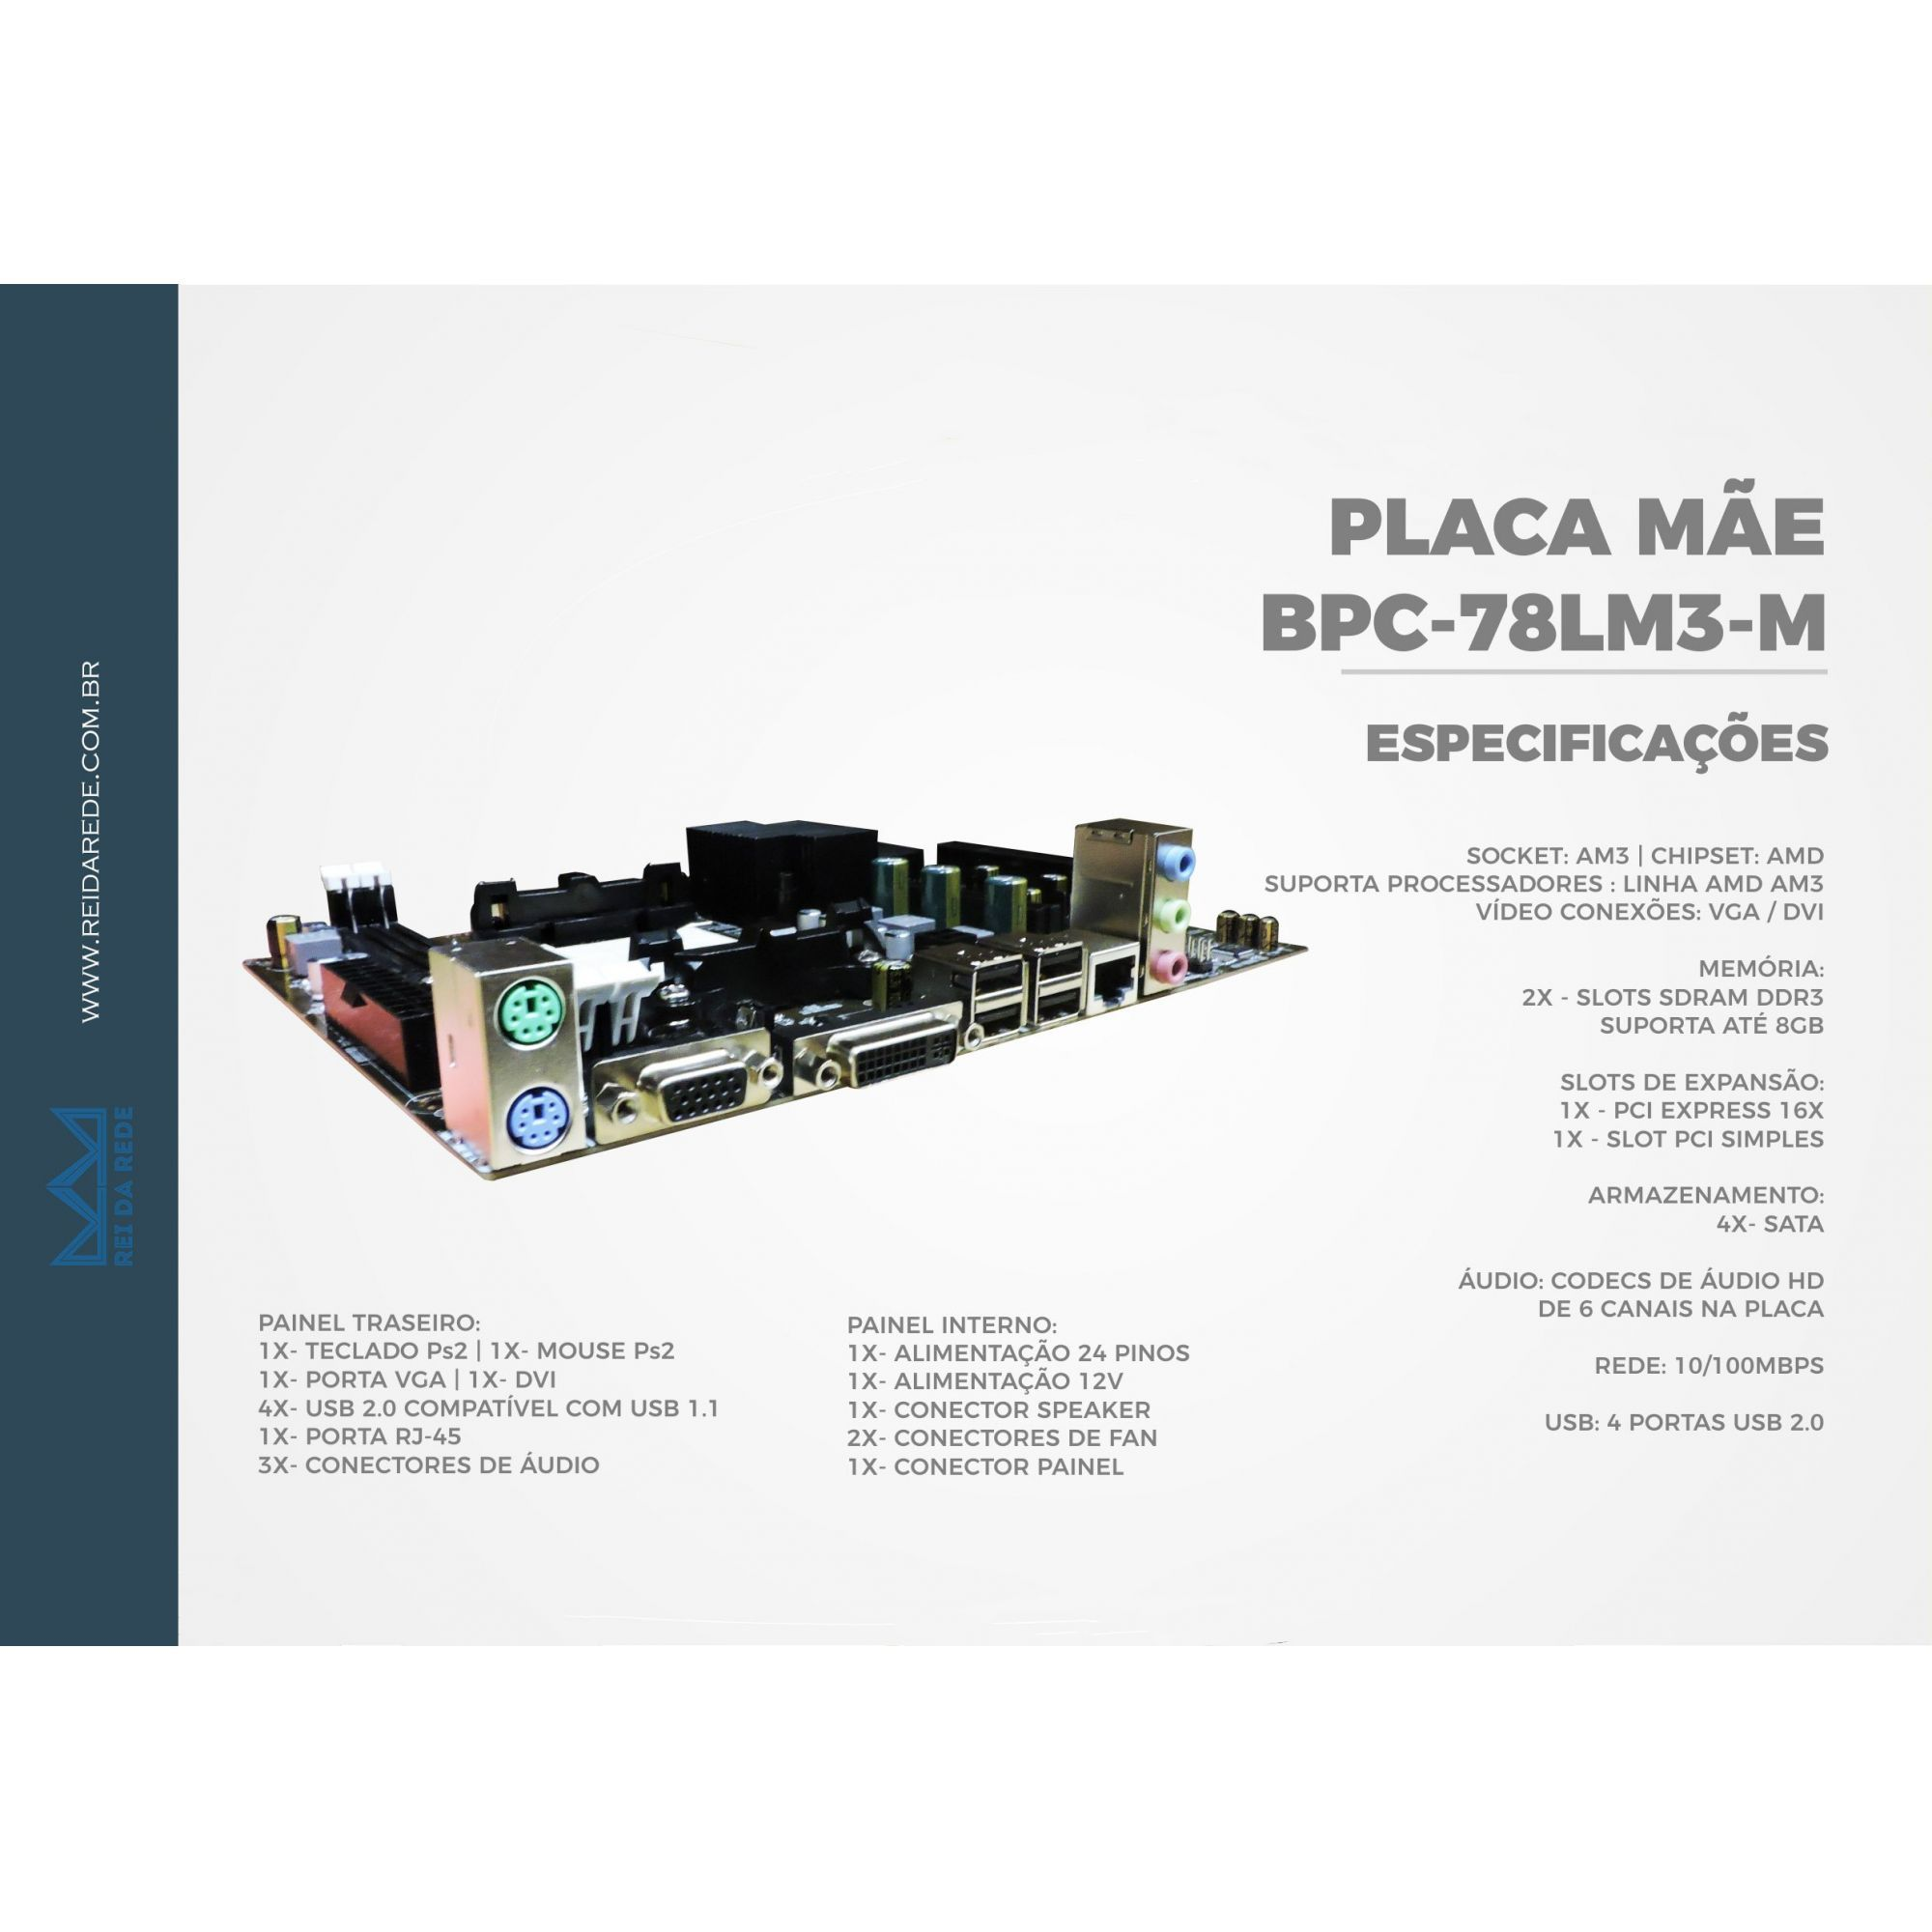 Placa Mãe AM3 BPC-78LM3-M BPC OEM